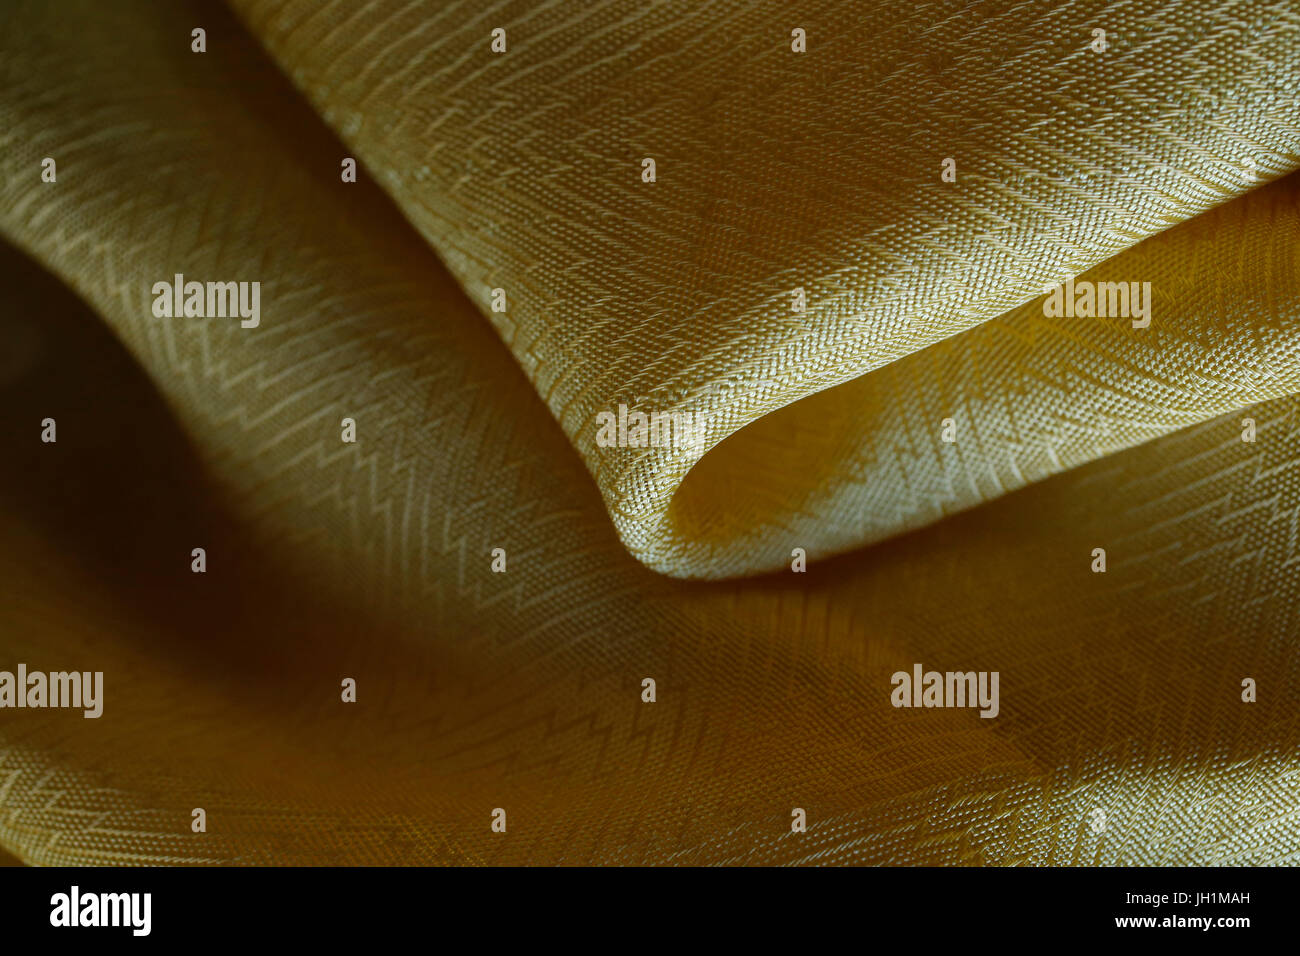 Yellow fabric. France. - Stock Image